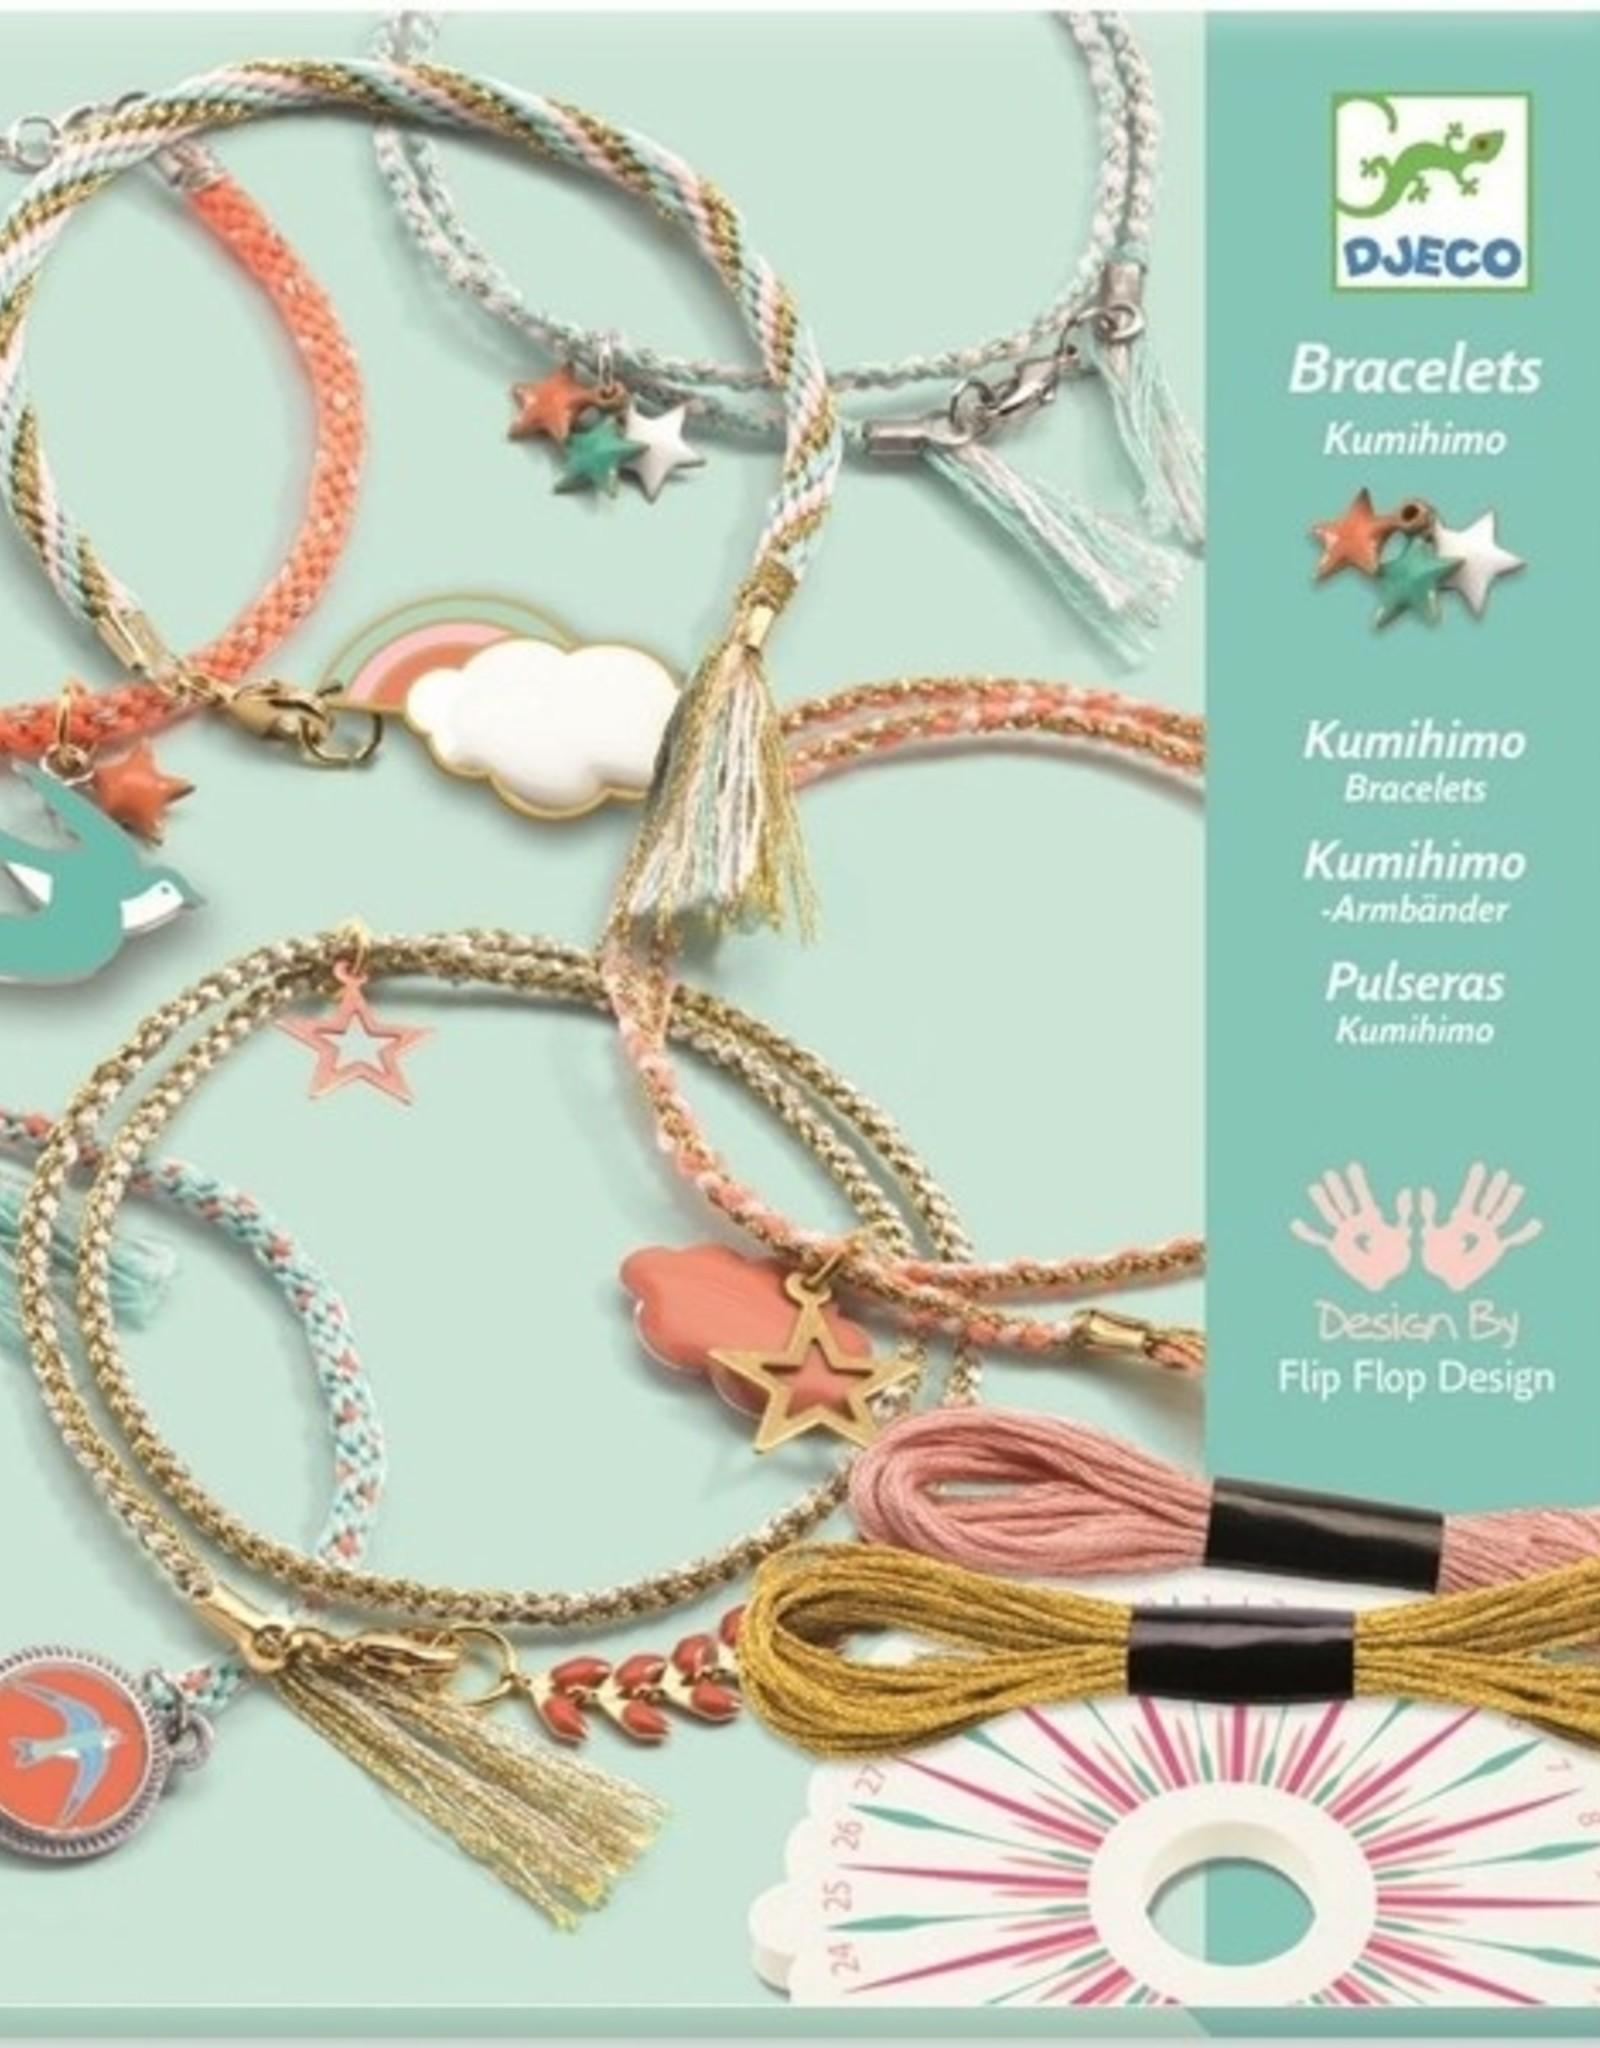 Djeco Bracelets - Celeste